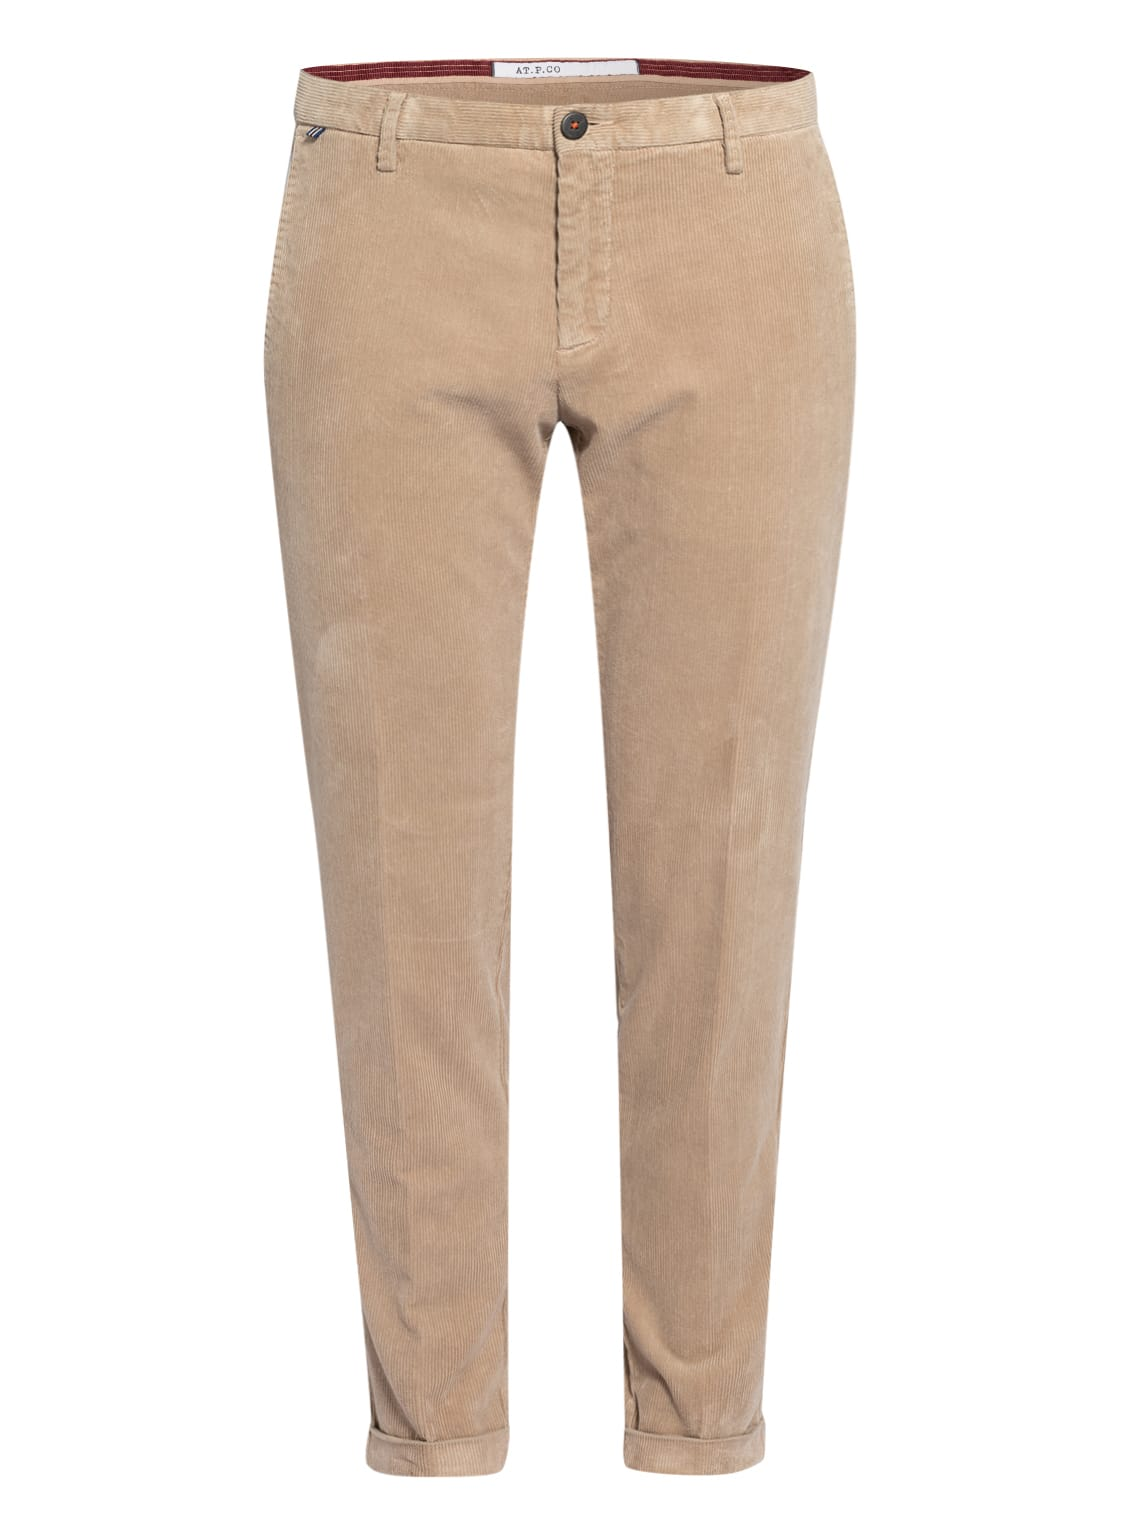 Image of At.P.Co Cordhose Scott Extra Slim Fit beige